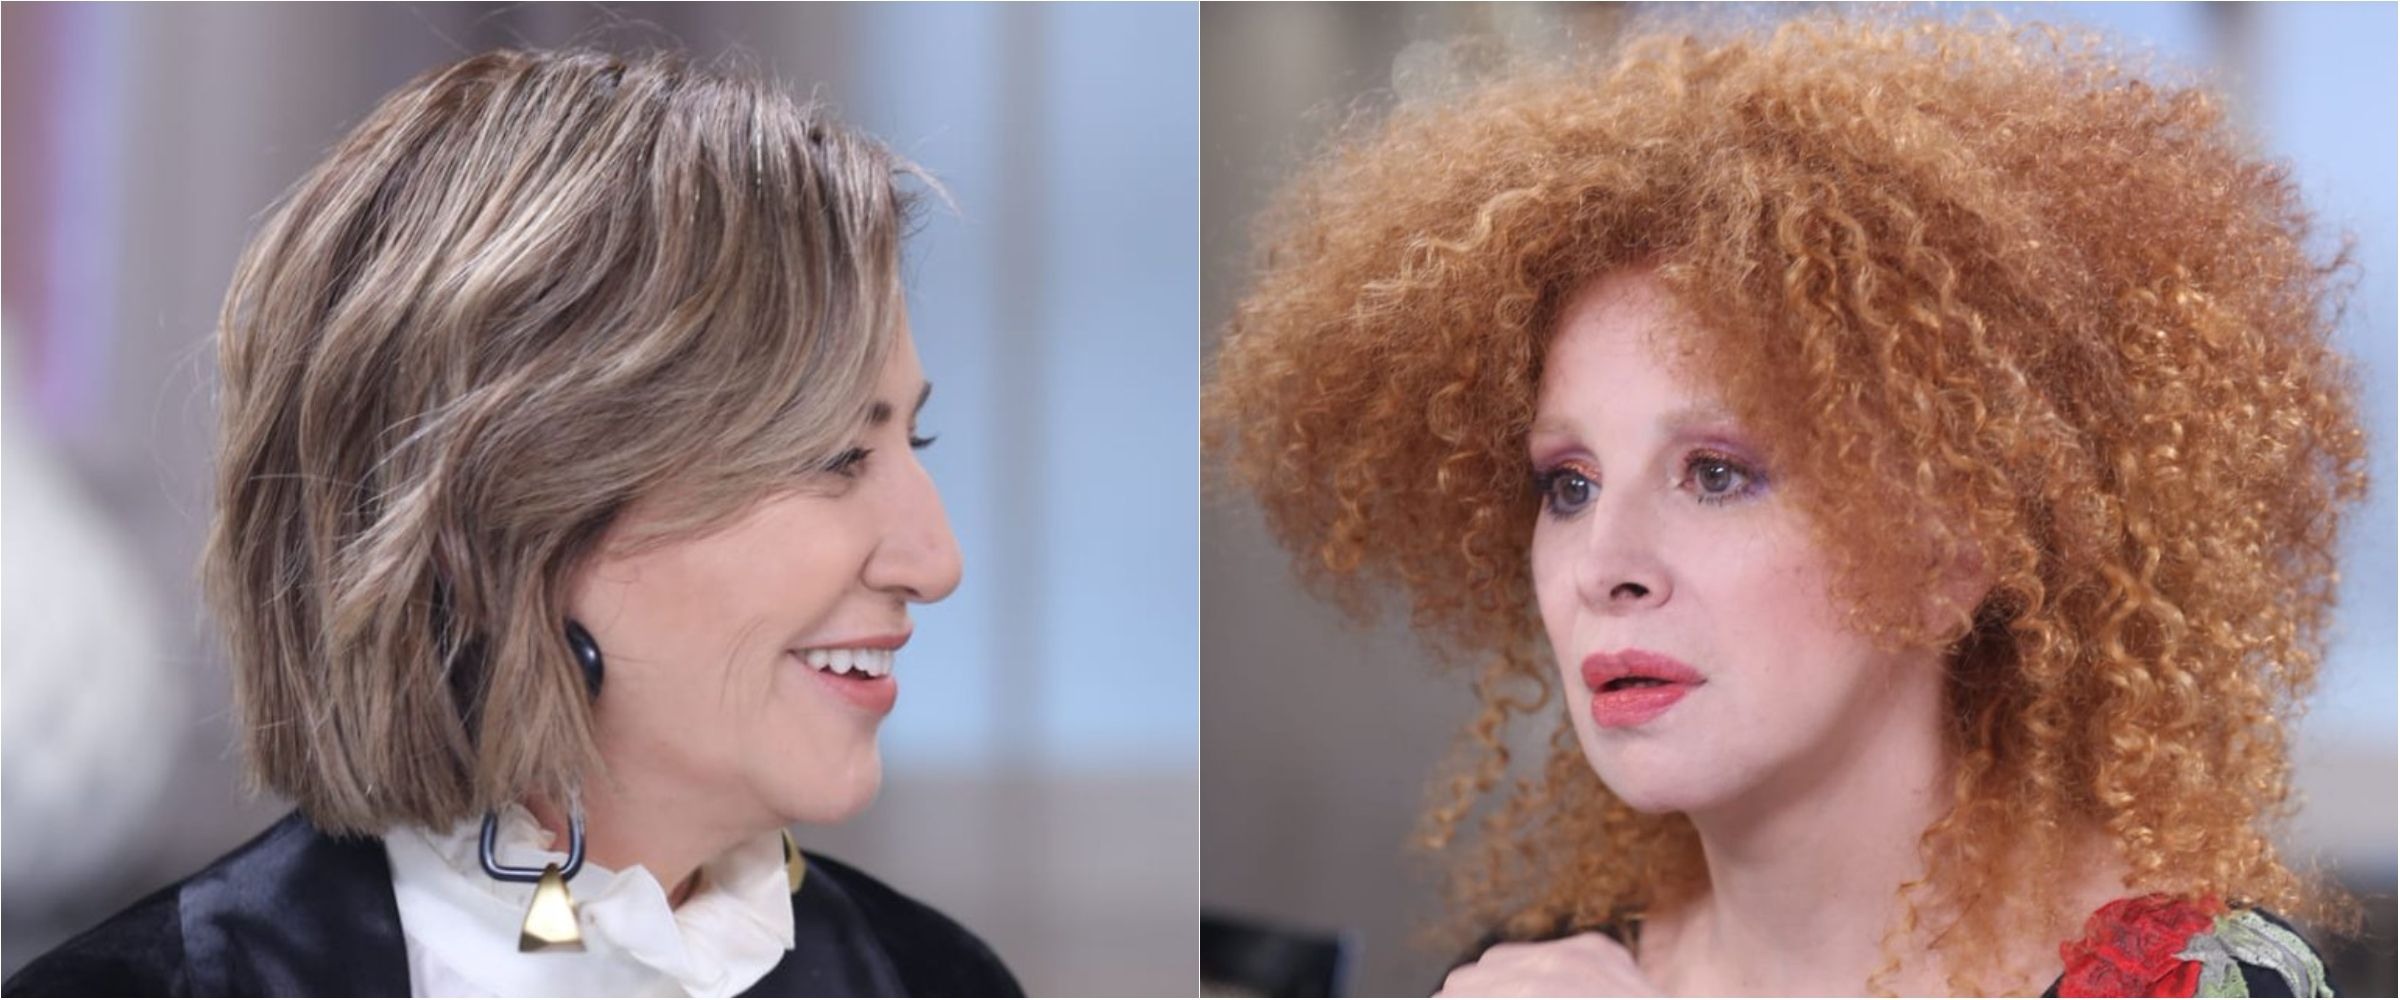 Mercedes Morán y Nacha Guevara